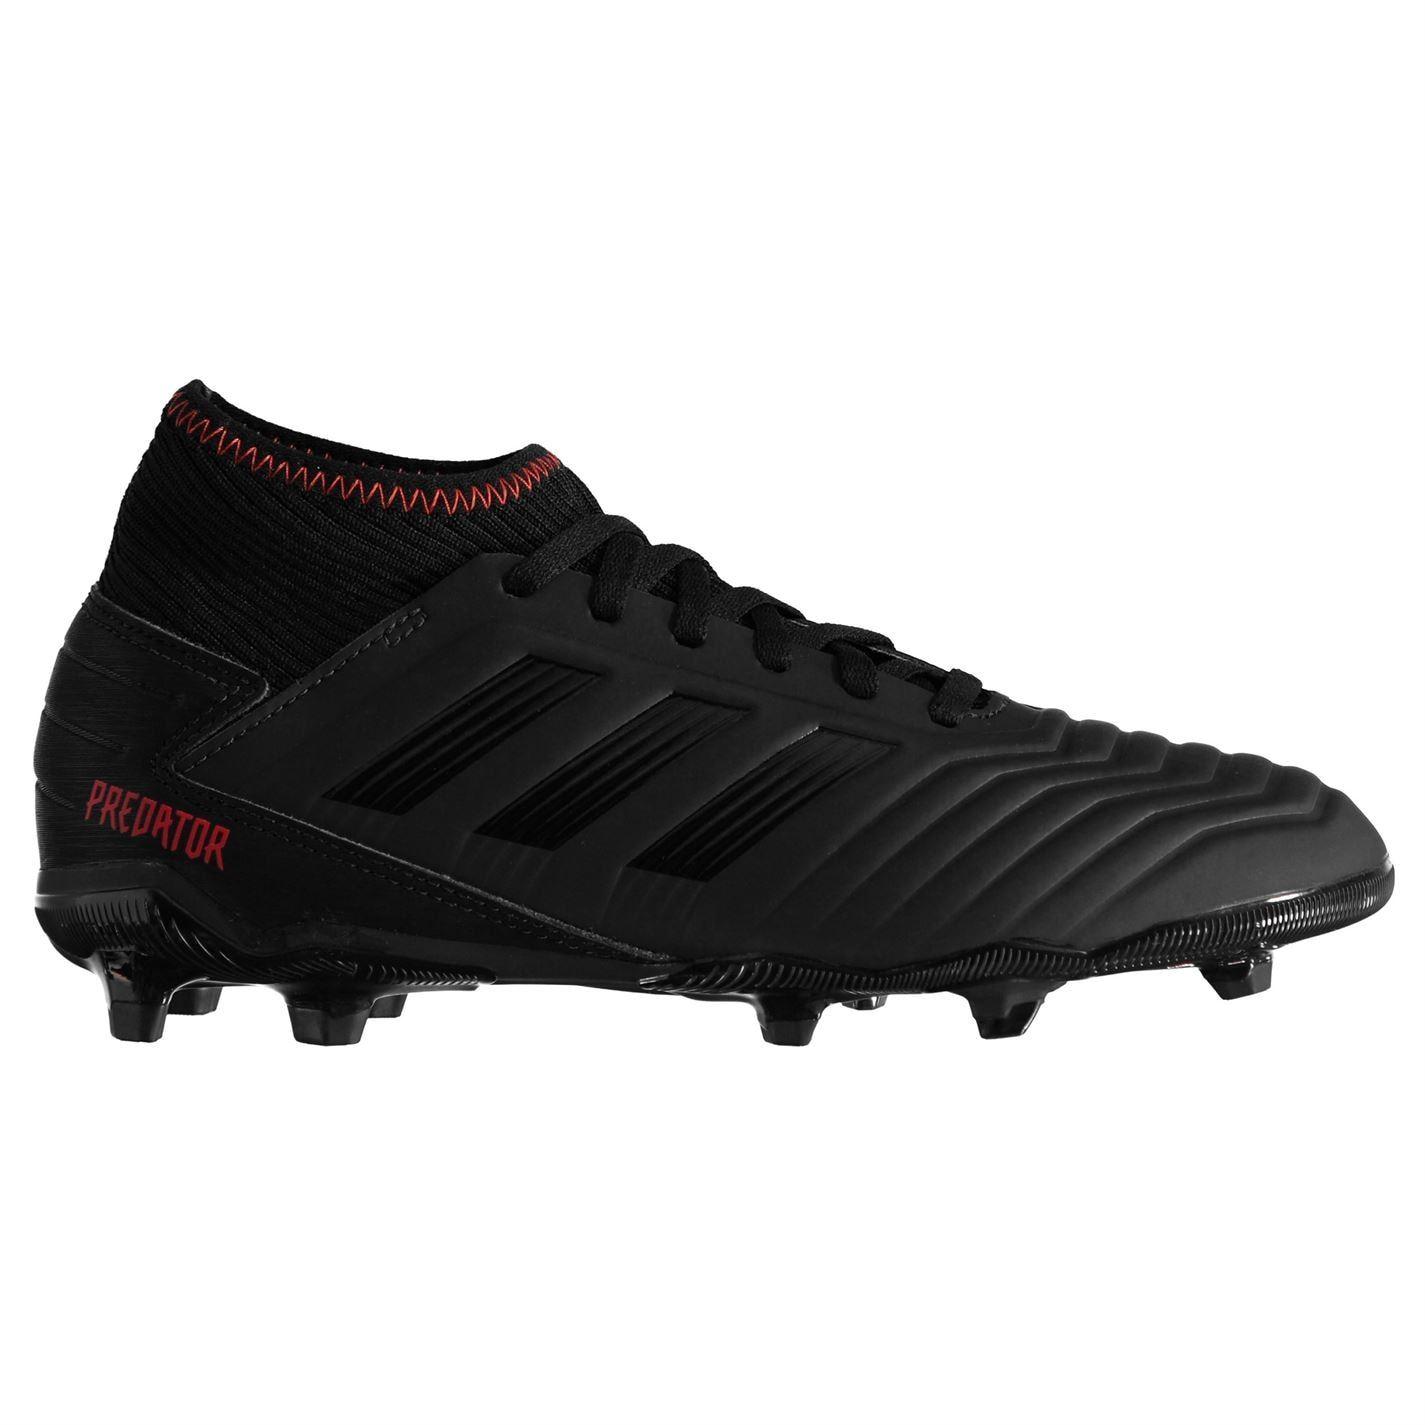 Adidas-Predator-Junior-19-3-FG-Firm-Ground-football-boots-Boys-Football-Chaussures miniature 4